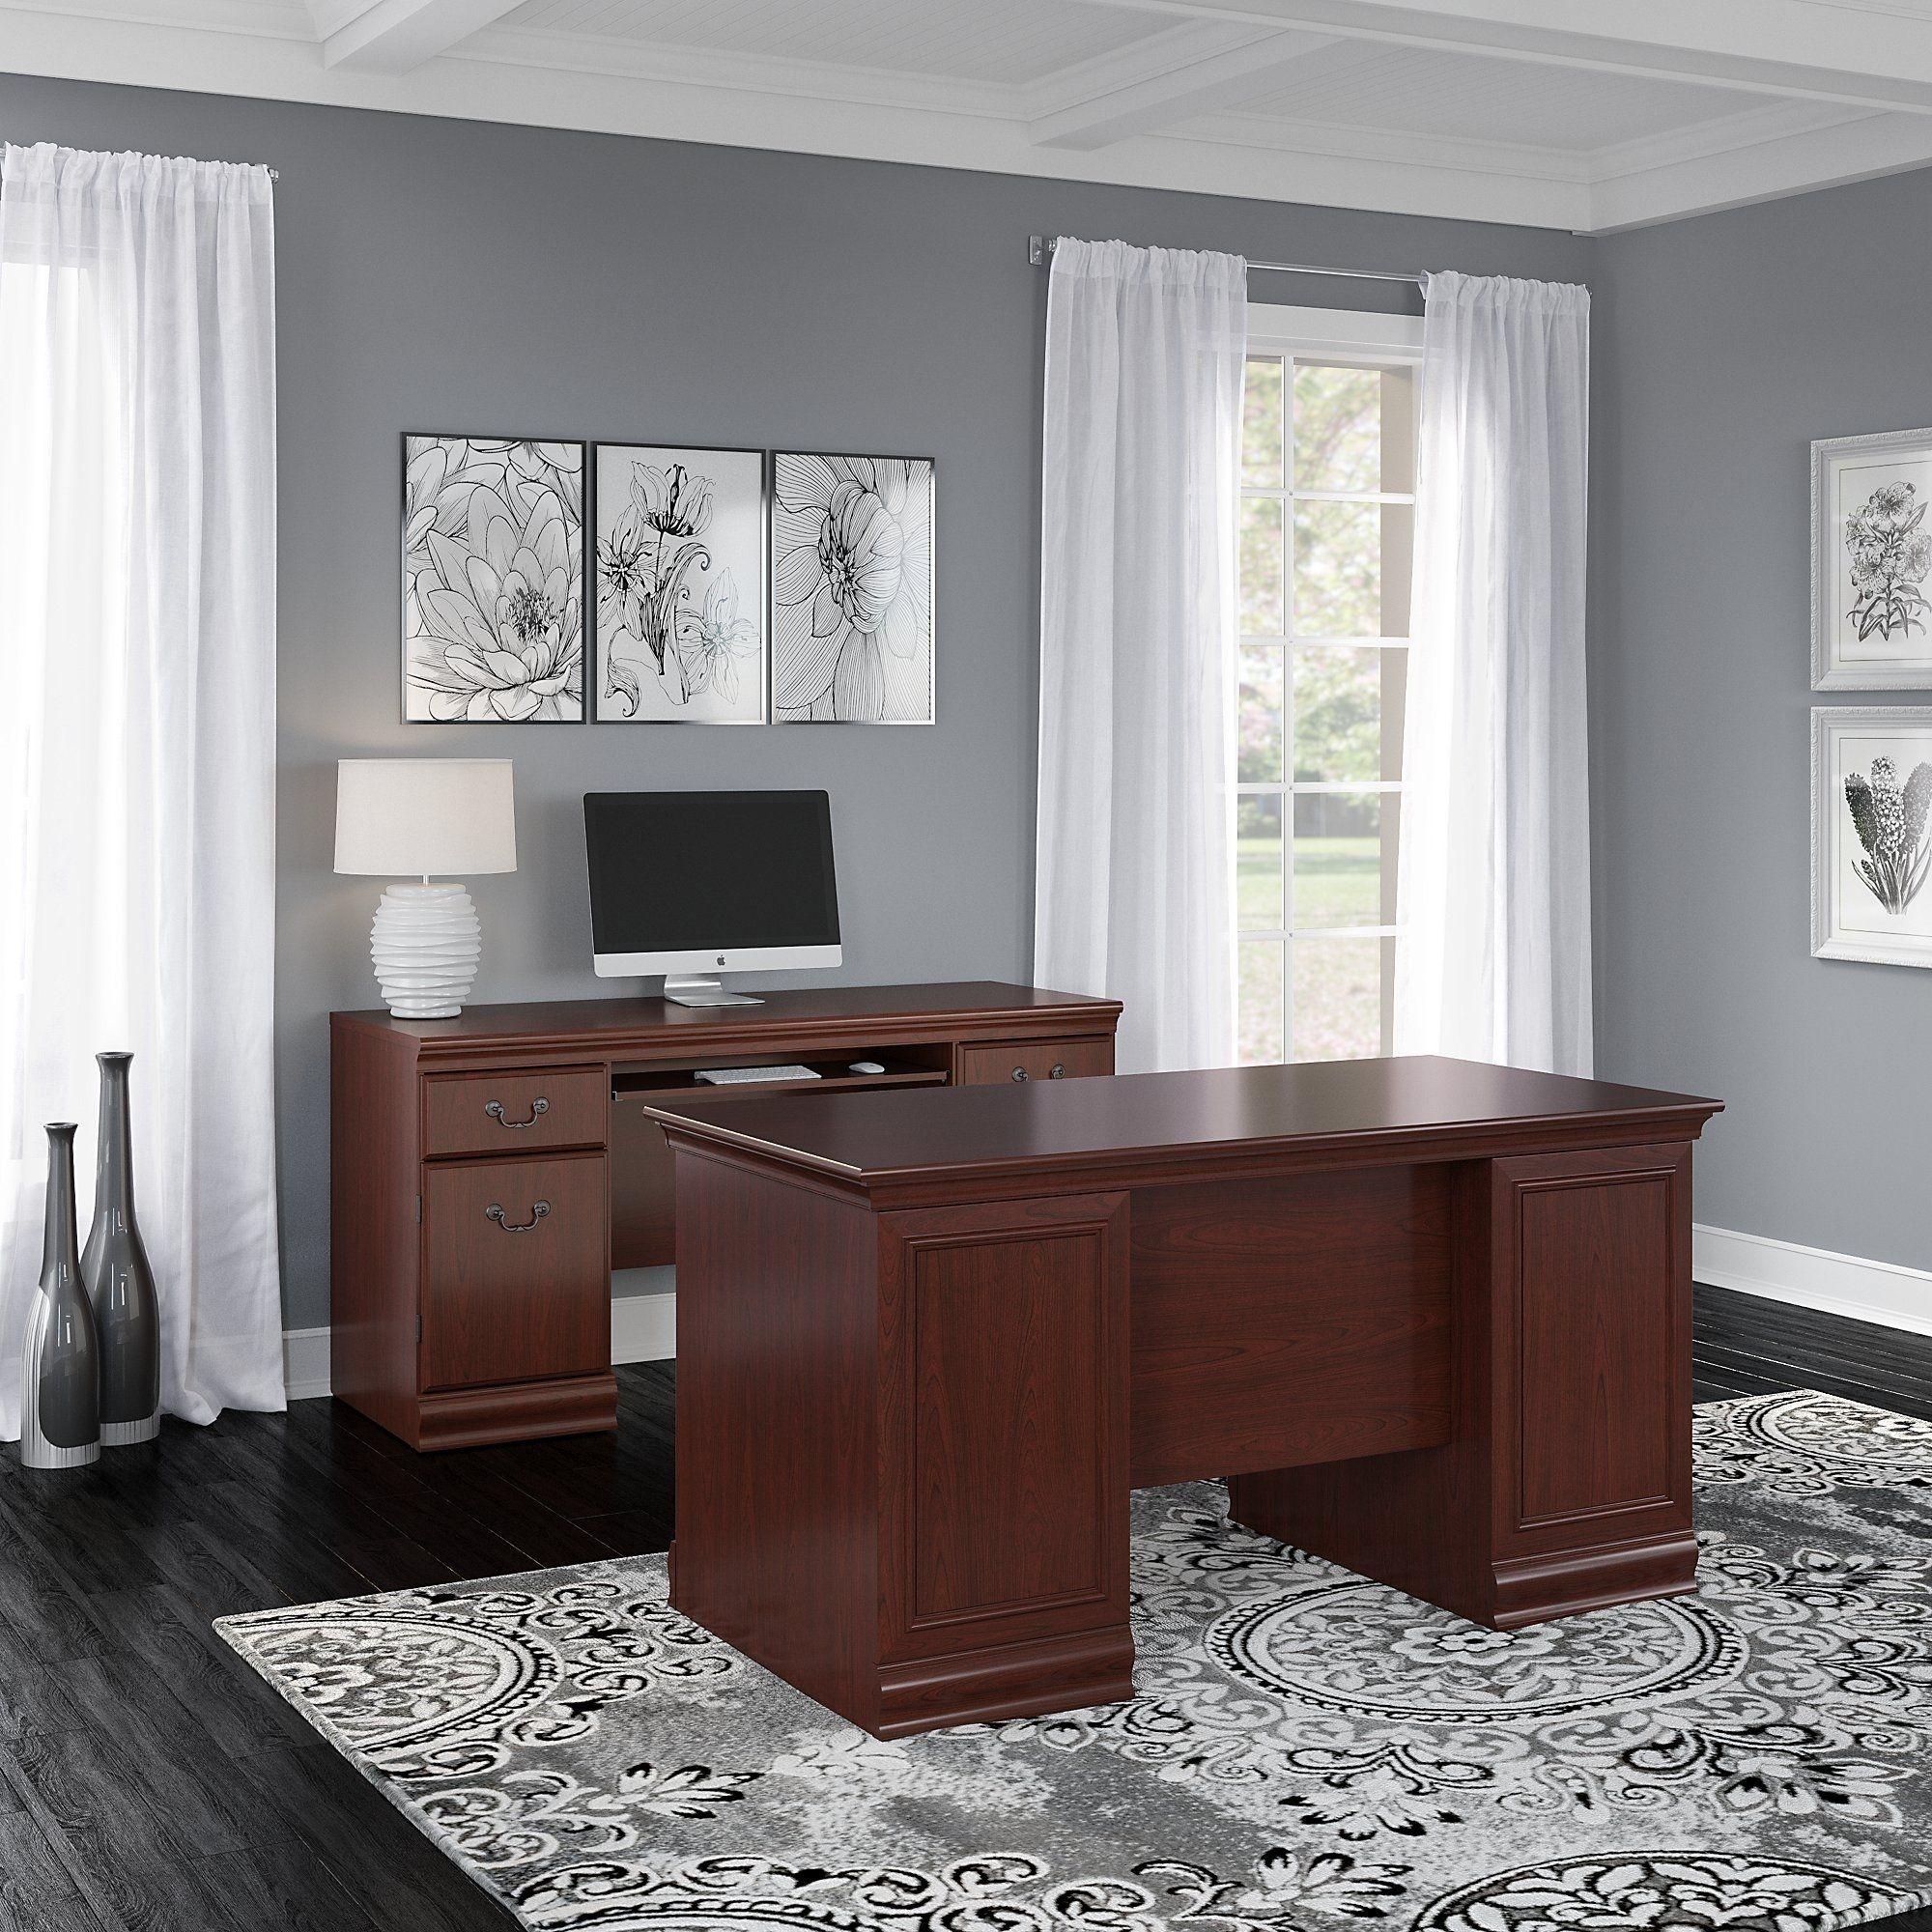 New Contemporary Cherry Wood Executive Office Desk Utm1 Office Desk Set Modern Desk Furniture Executive Office Desk